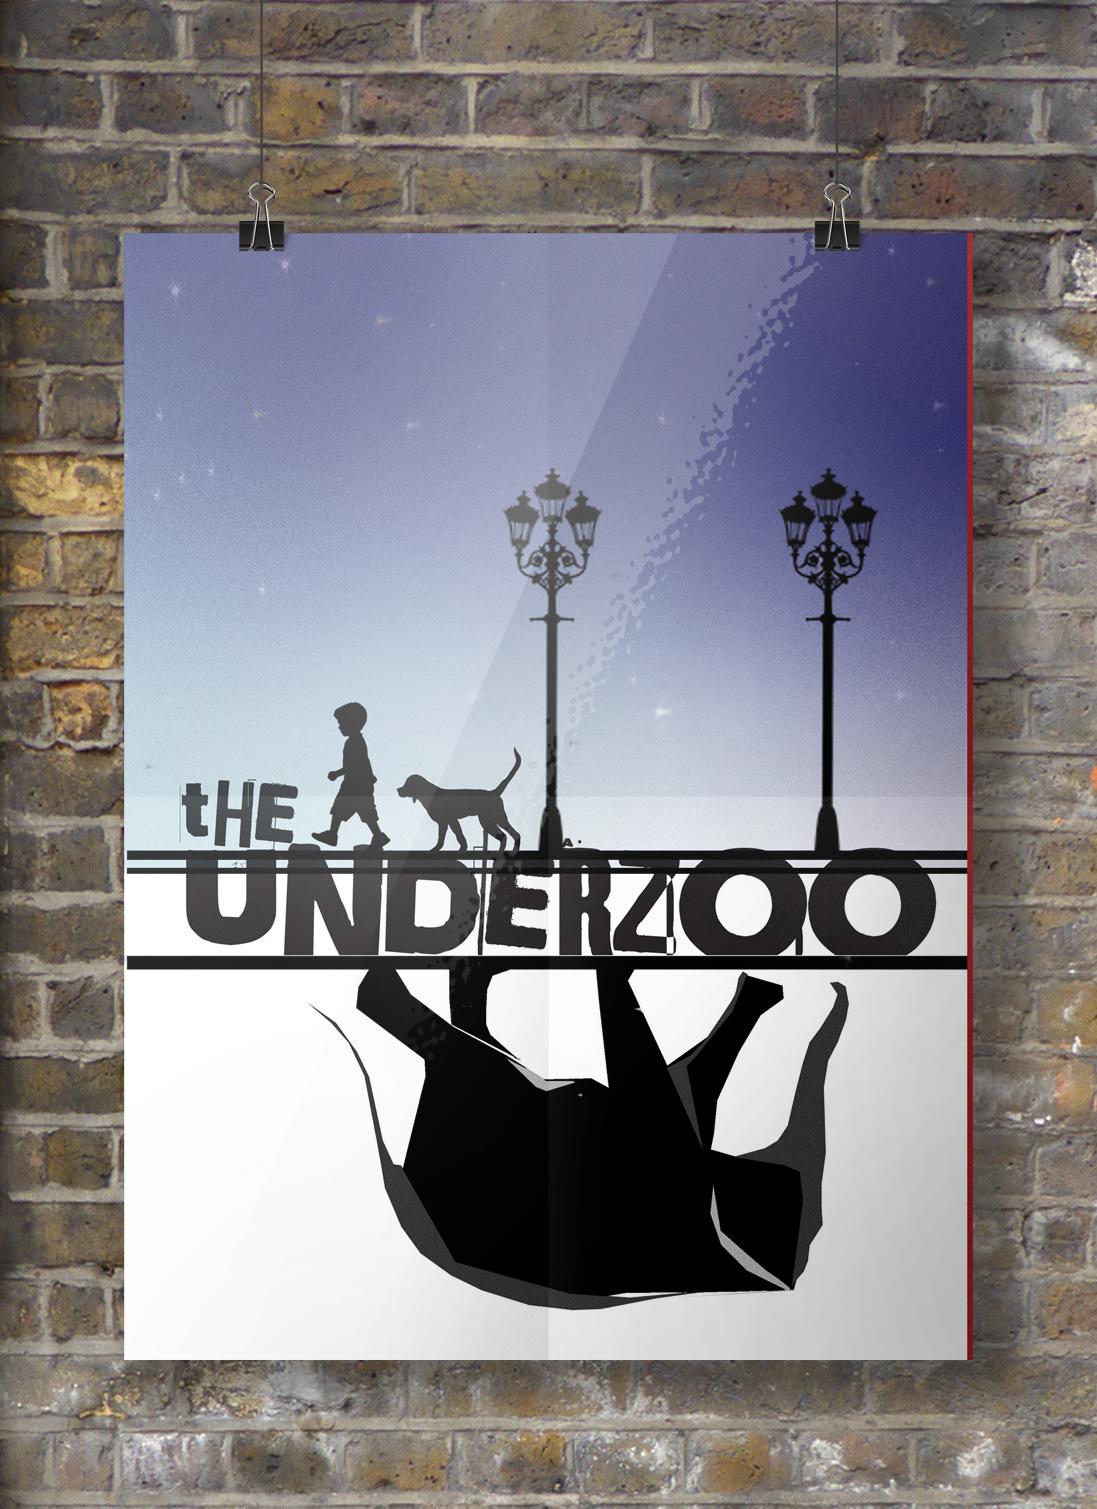 underzoo.jpg